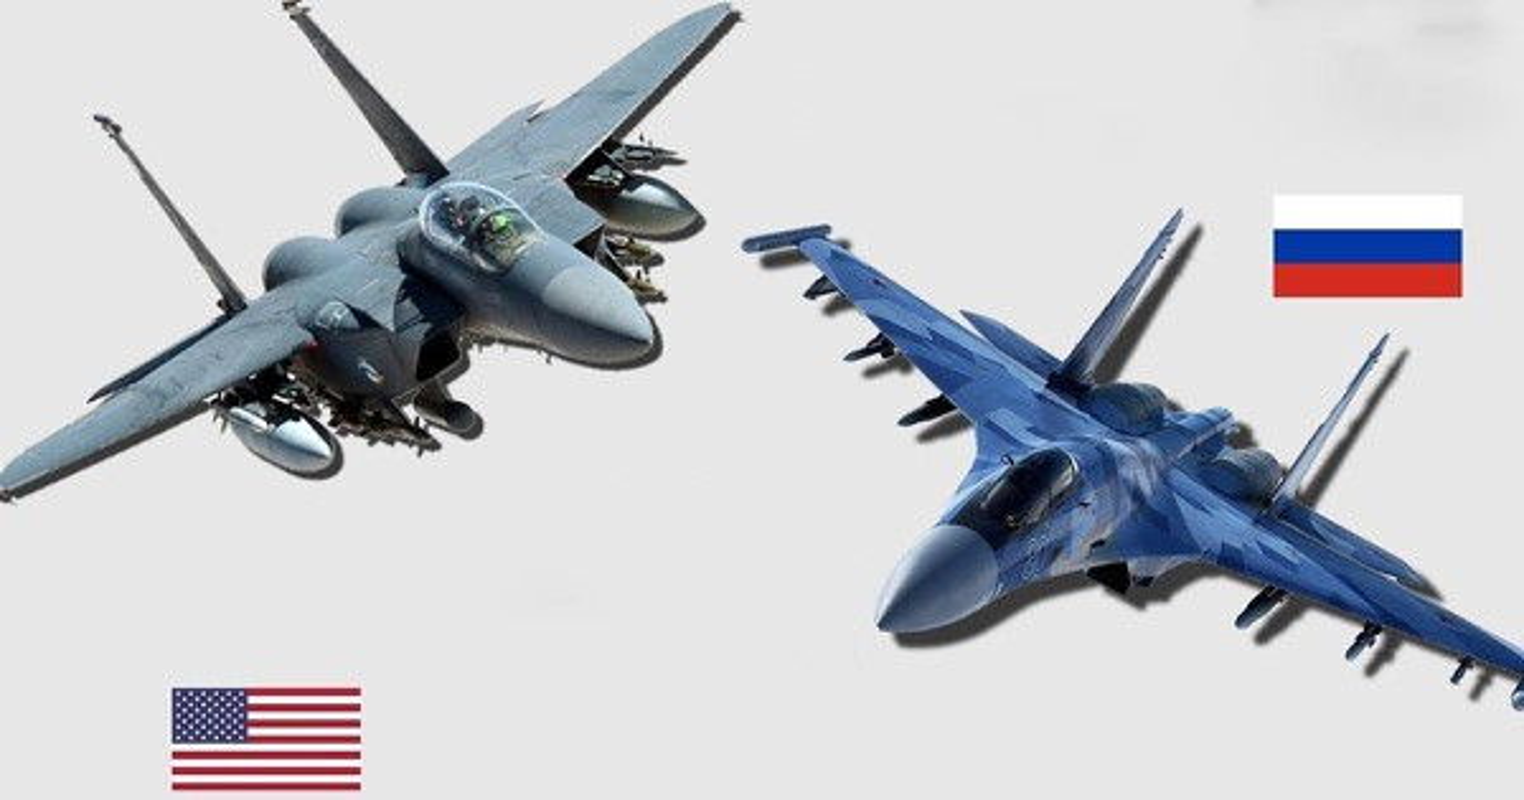 Su-35 cua Nga dau voi F-15EX cua My: Cuoc chien cua the he 4++-Hinh-12